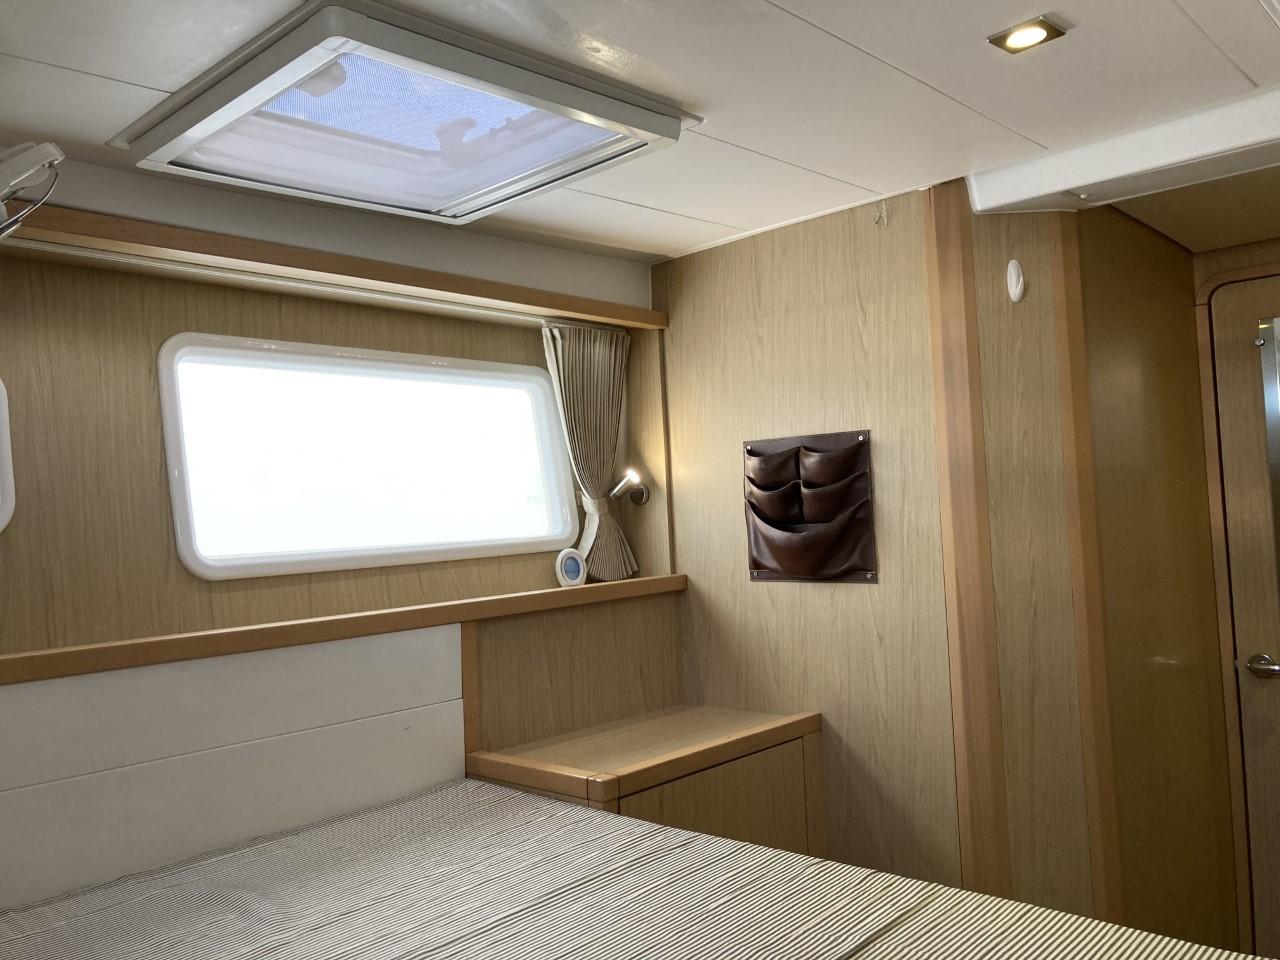 2014 lagoon 39 catamaran CARPE DIEM 4